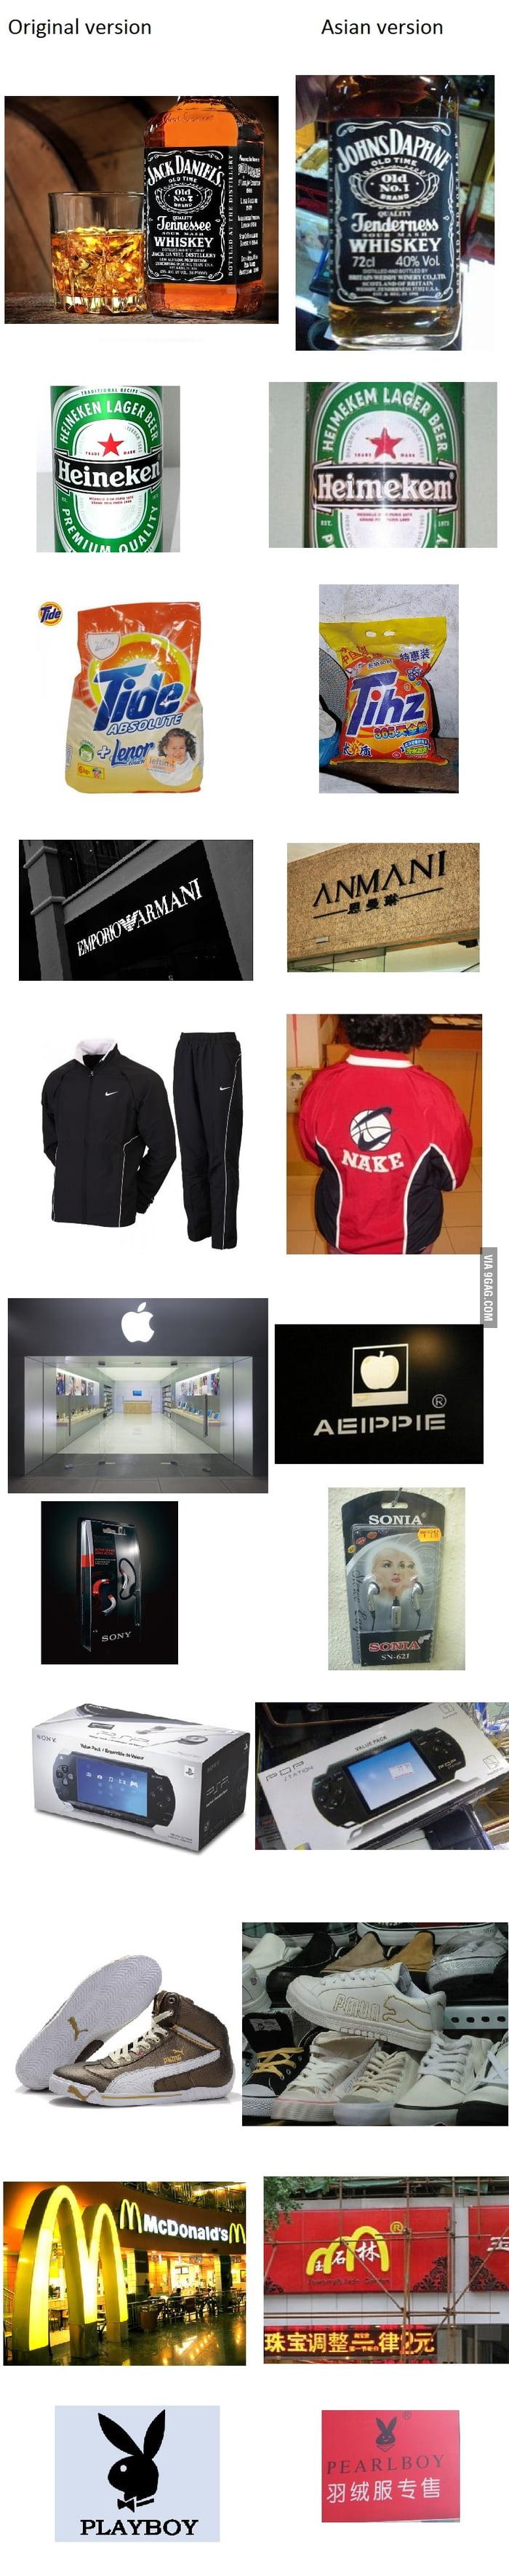 Brand level: Asian